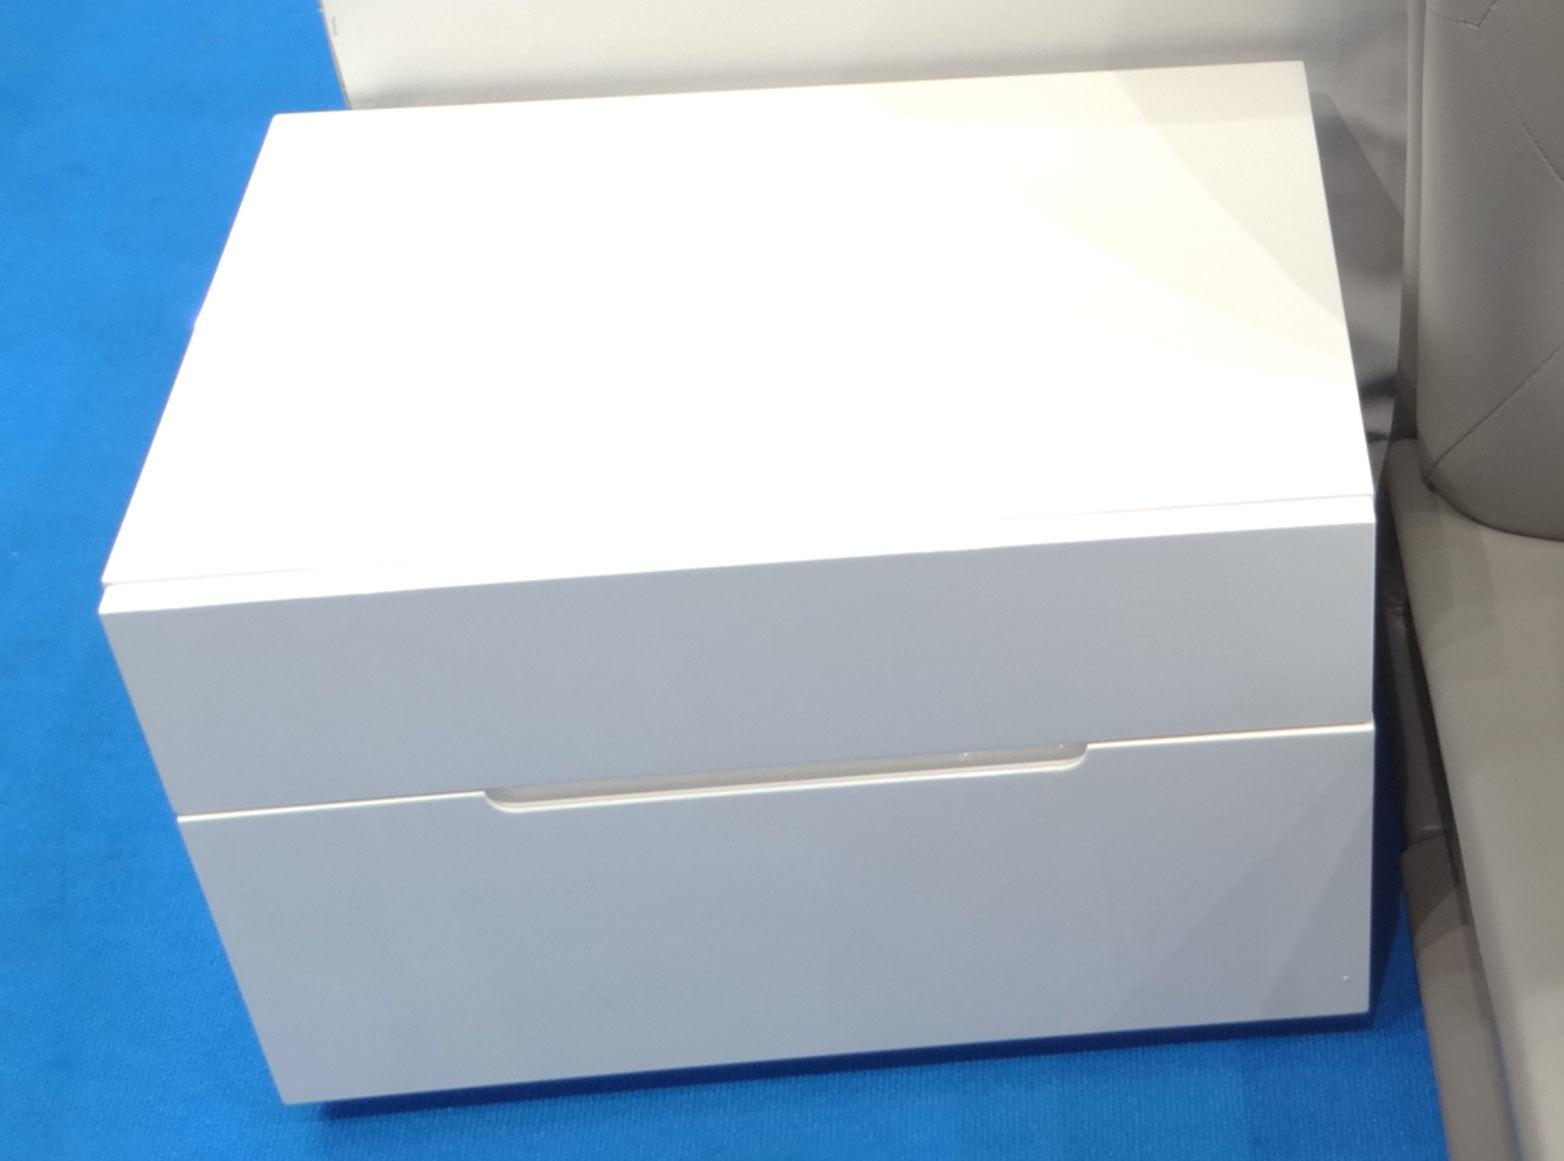 Тумба прикроватная DUPEN (Дюпен) М-100 белая